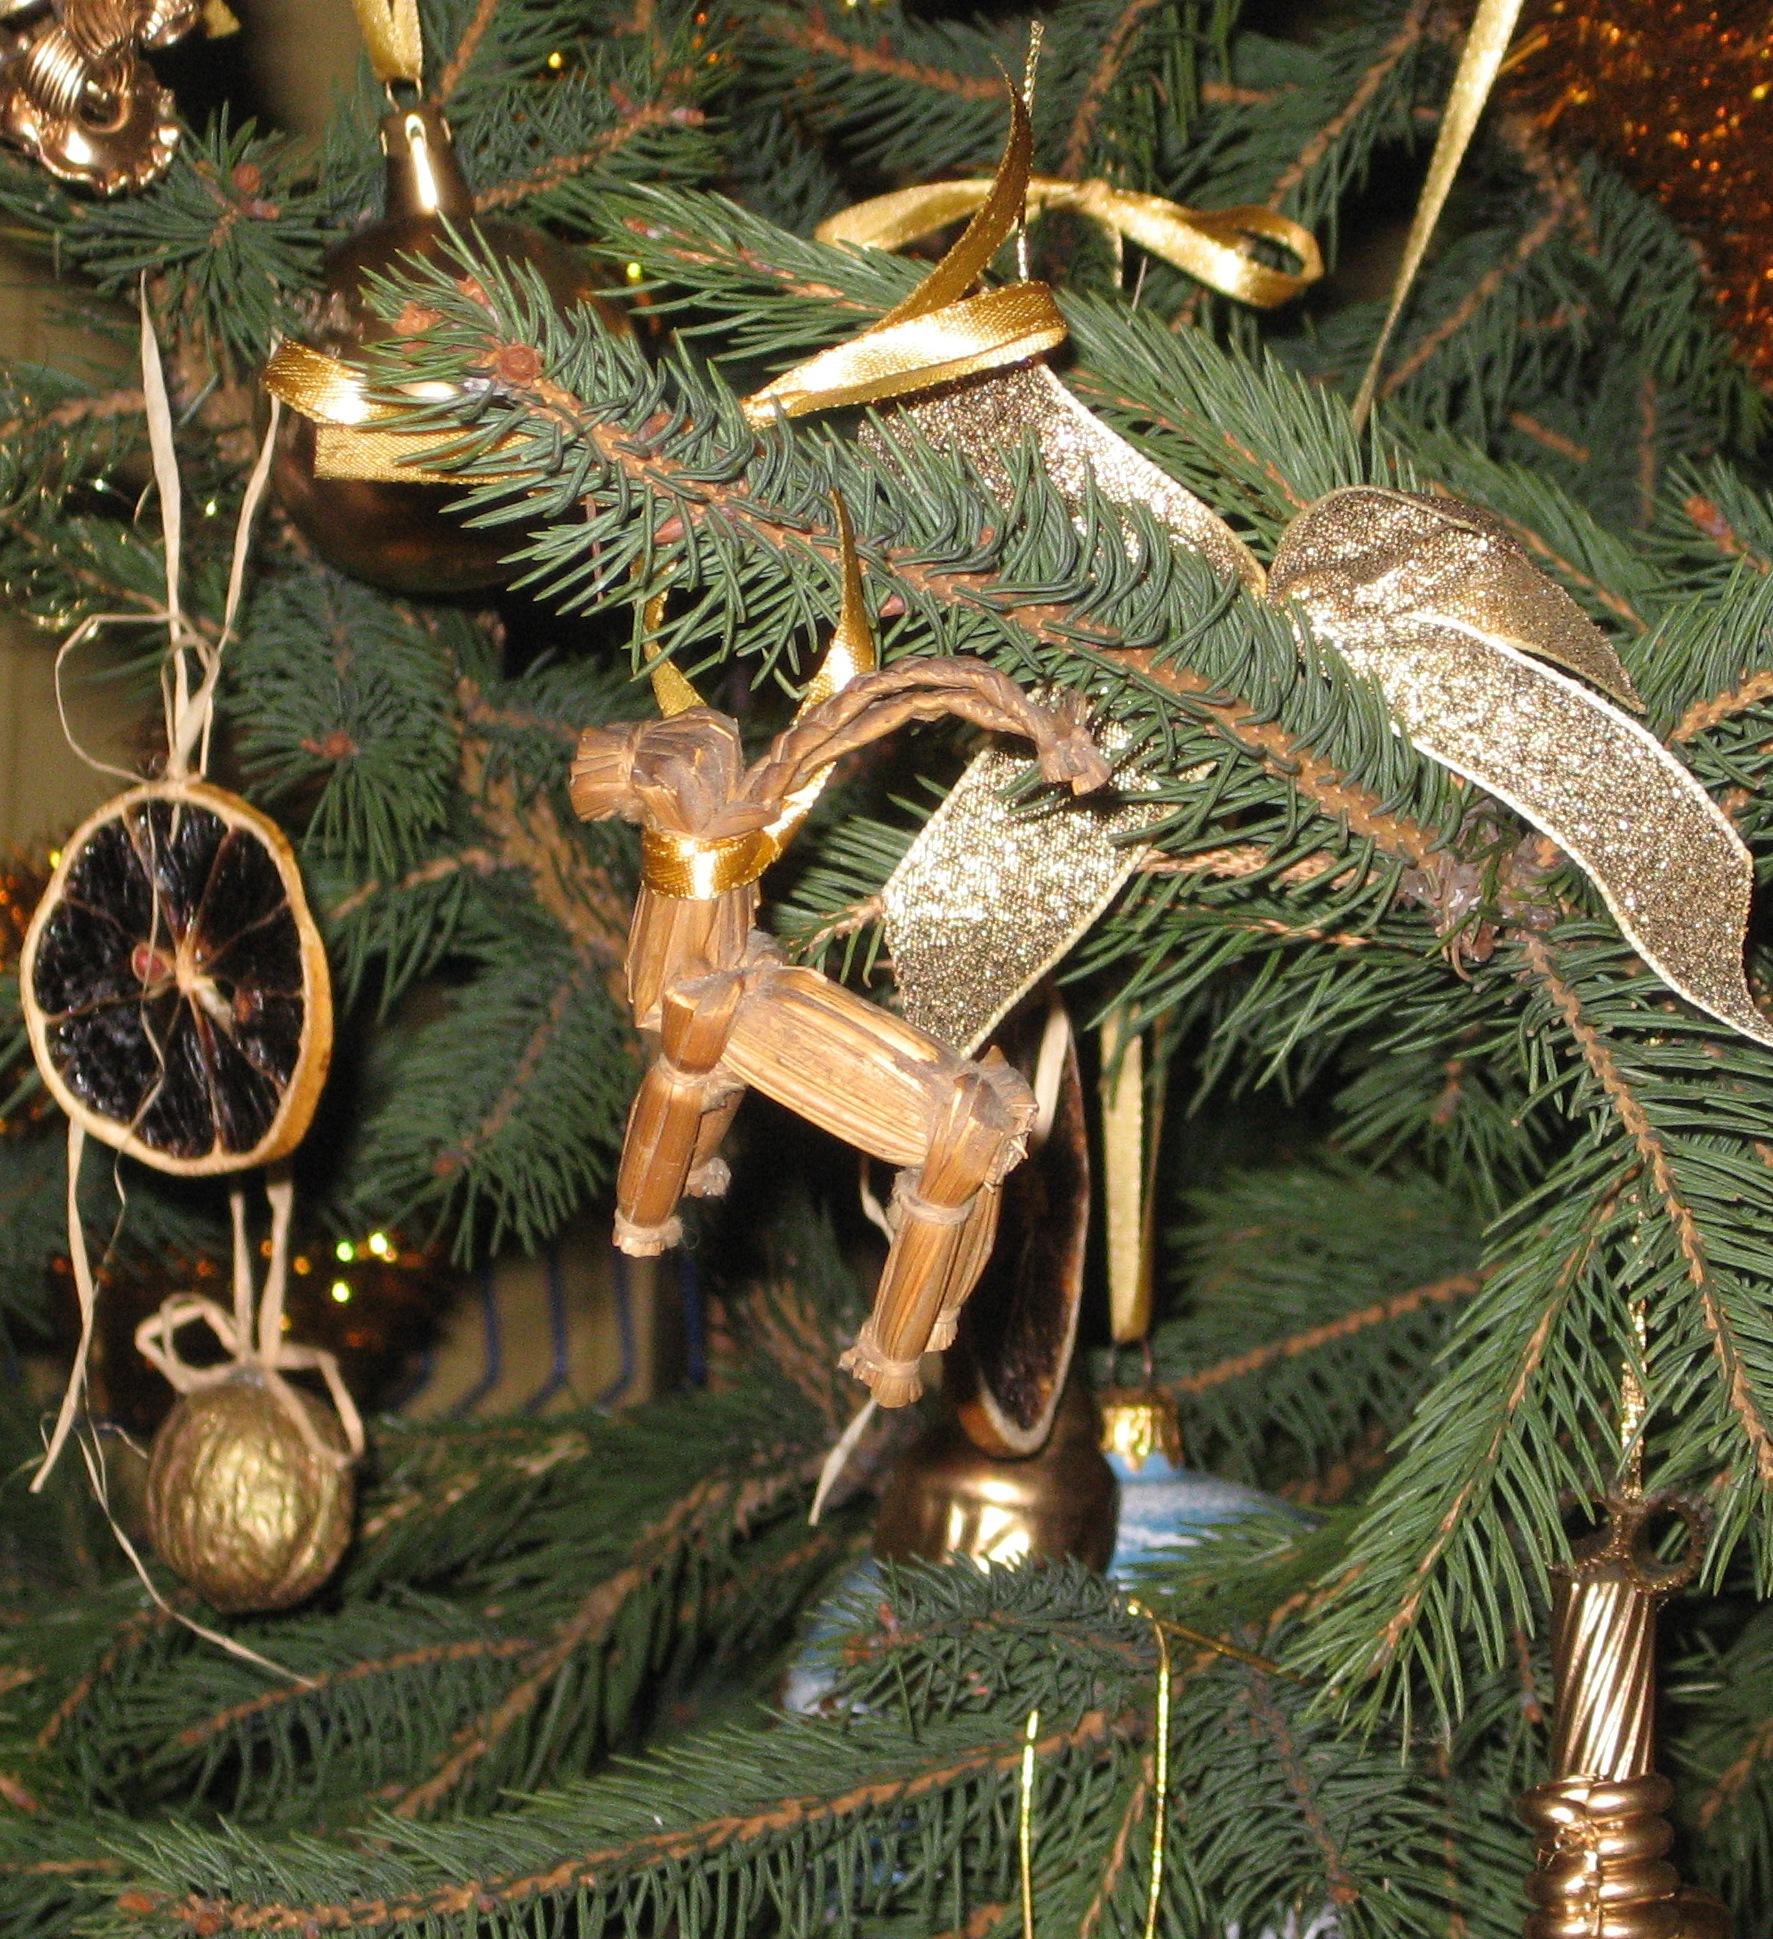 File:Yule Goat on the christmas tree.JPG - Wikimedia Commons